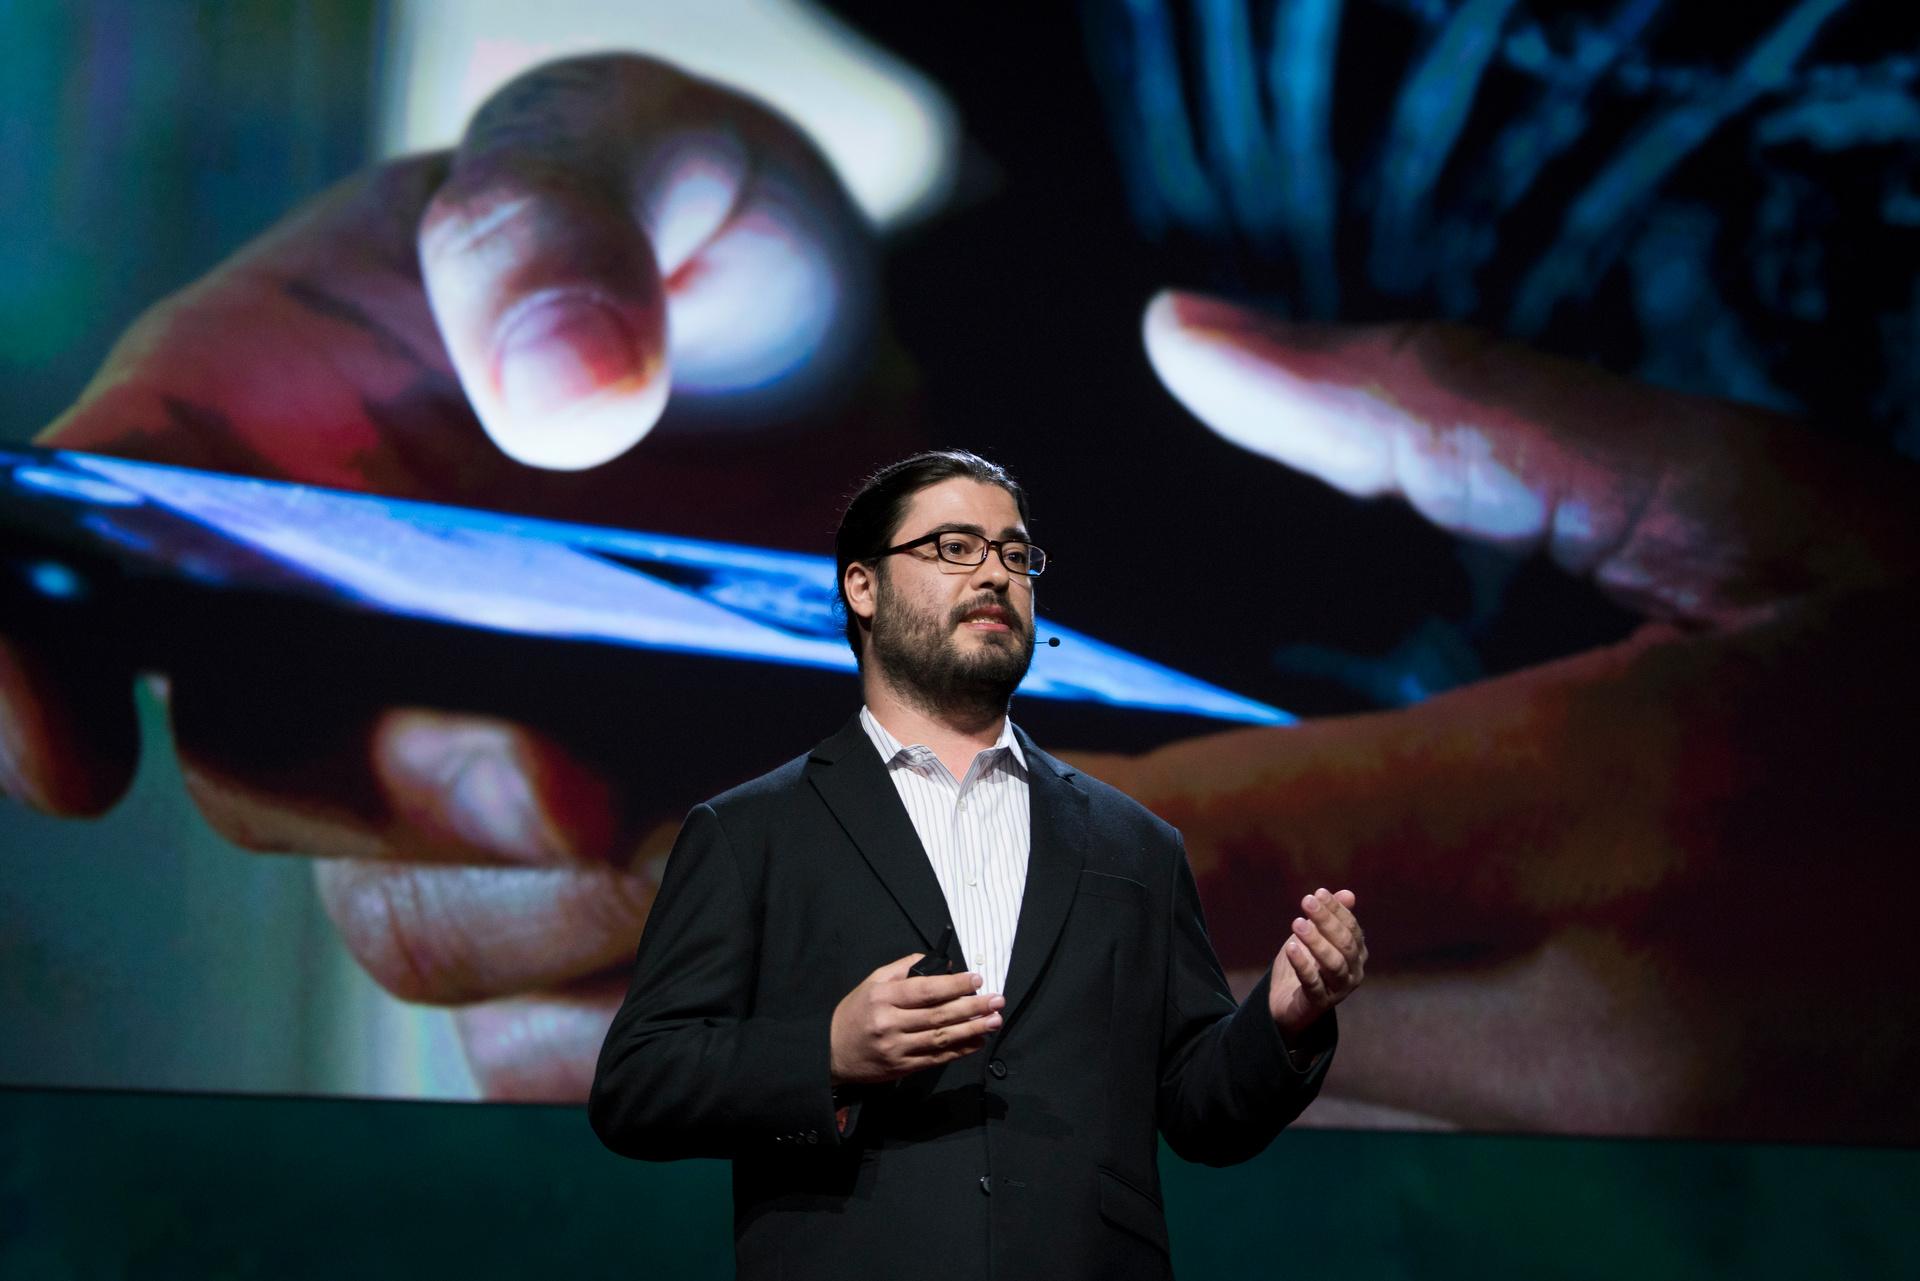 Chris Soghoian at TEDSummit2016, June 26 - 30, 2016, Banff, Canada. Photo: Bret Hartman / TED